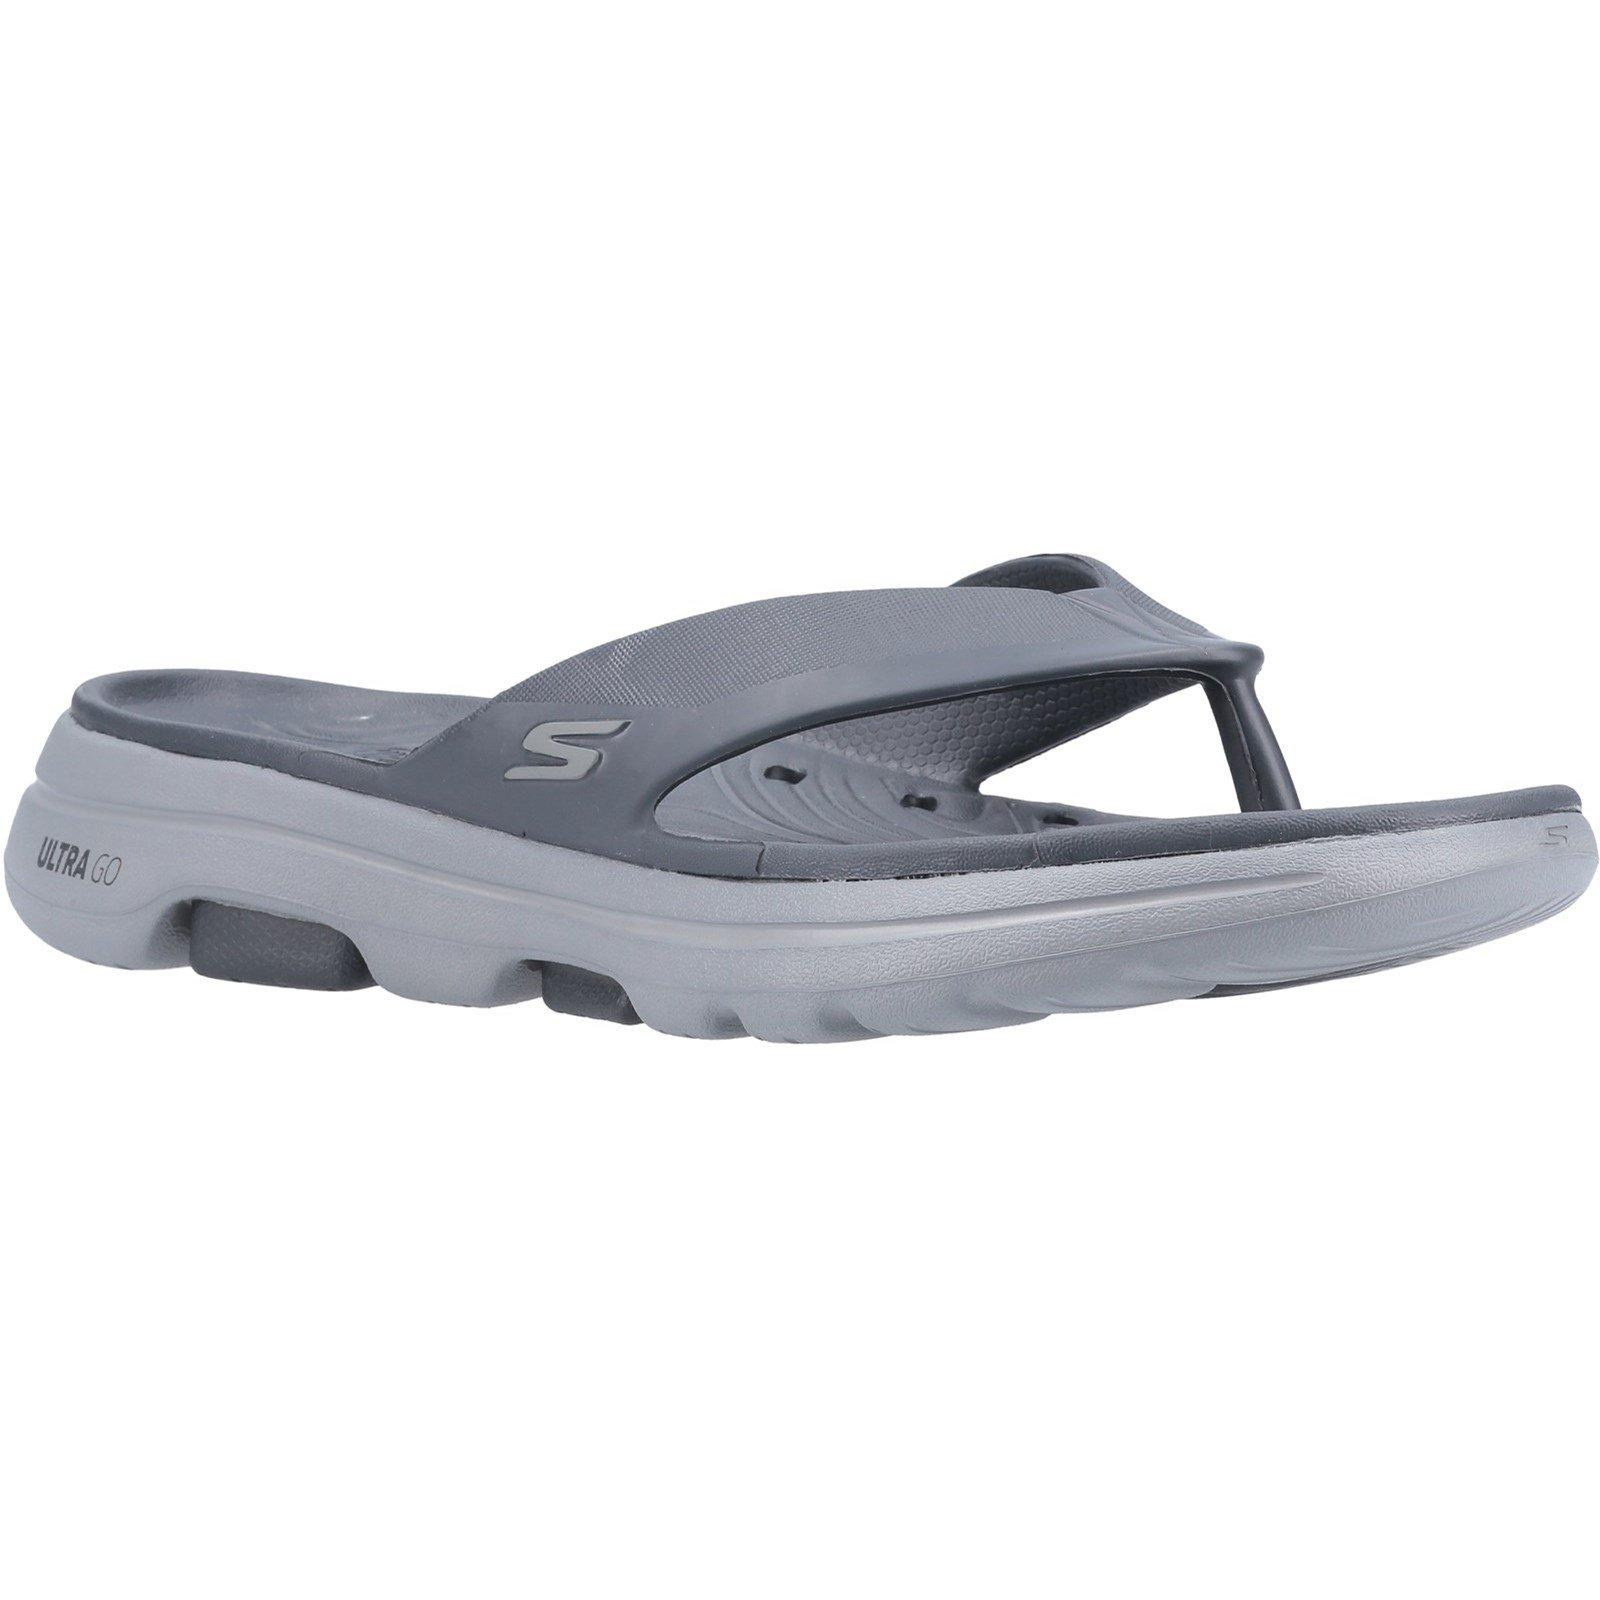 Skechers Men's GOwalk 5 Cabana Toe Post Sandal Charcoal 32207 - Charcoal 8